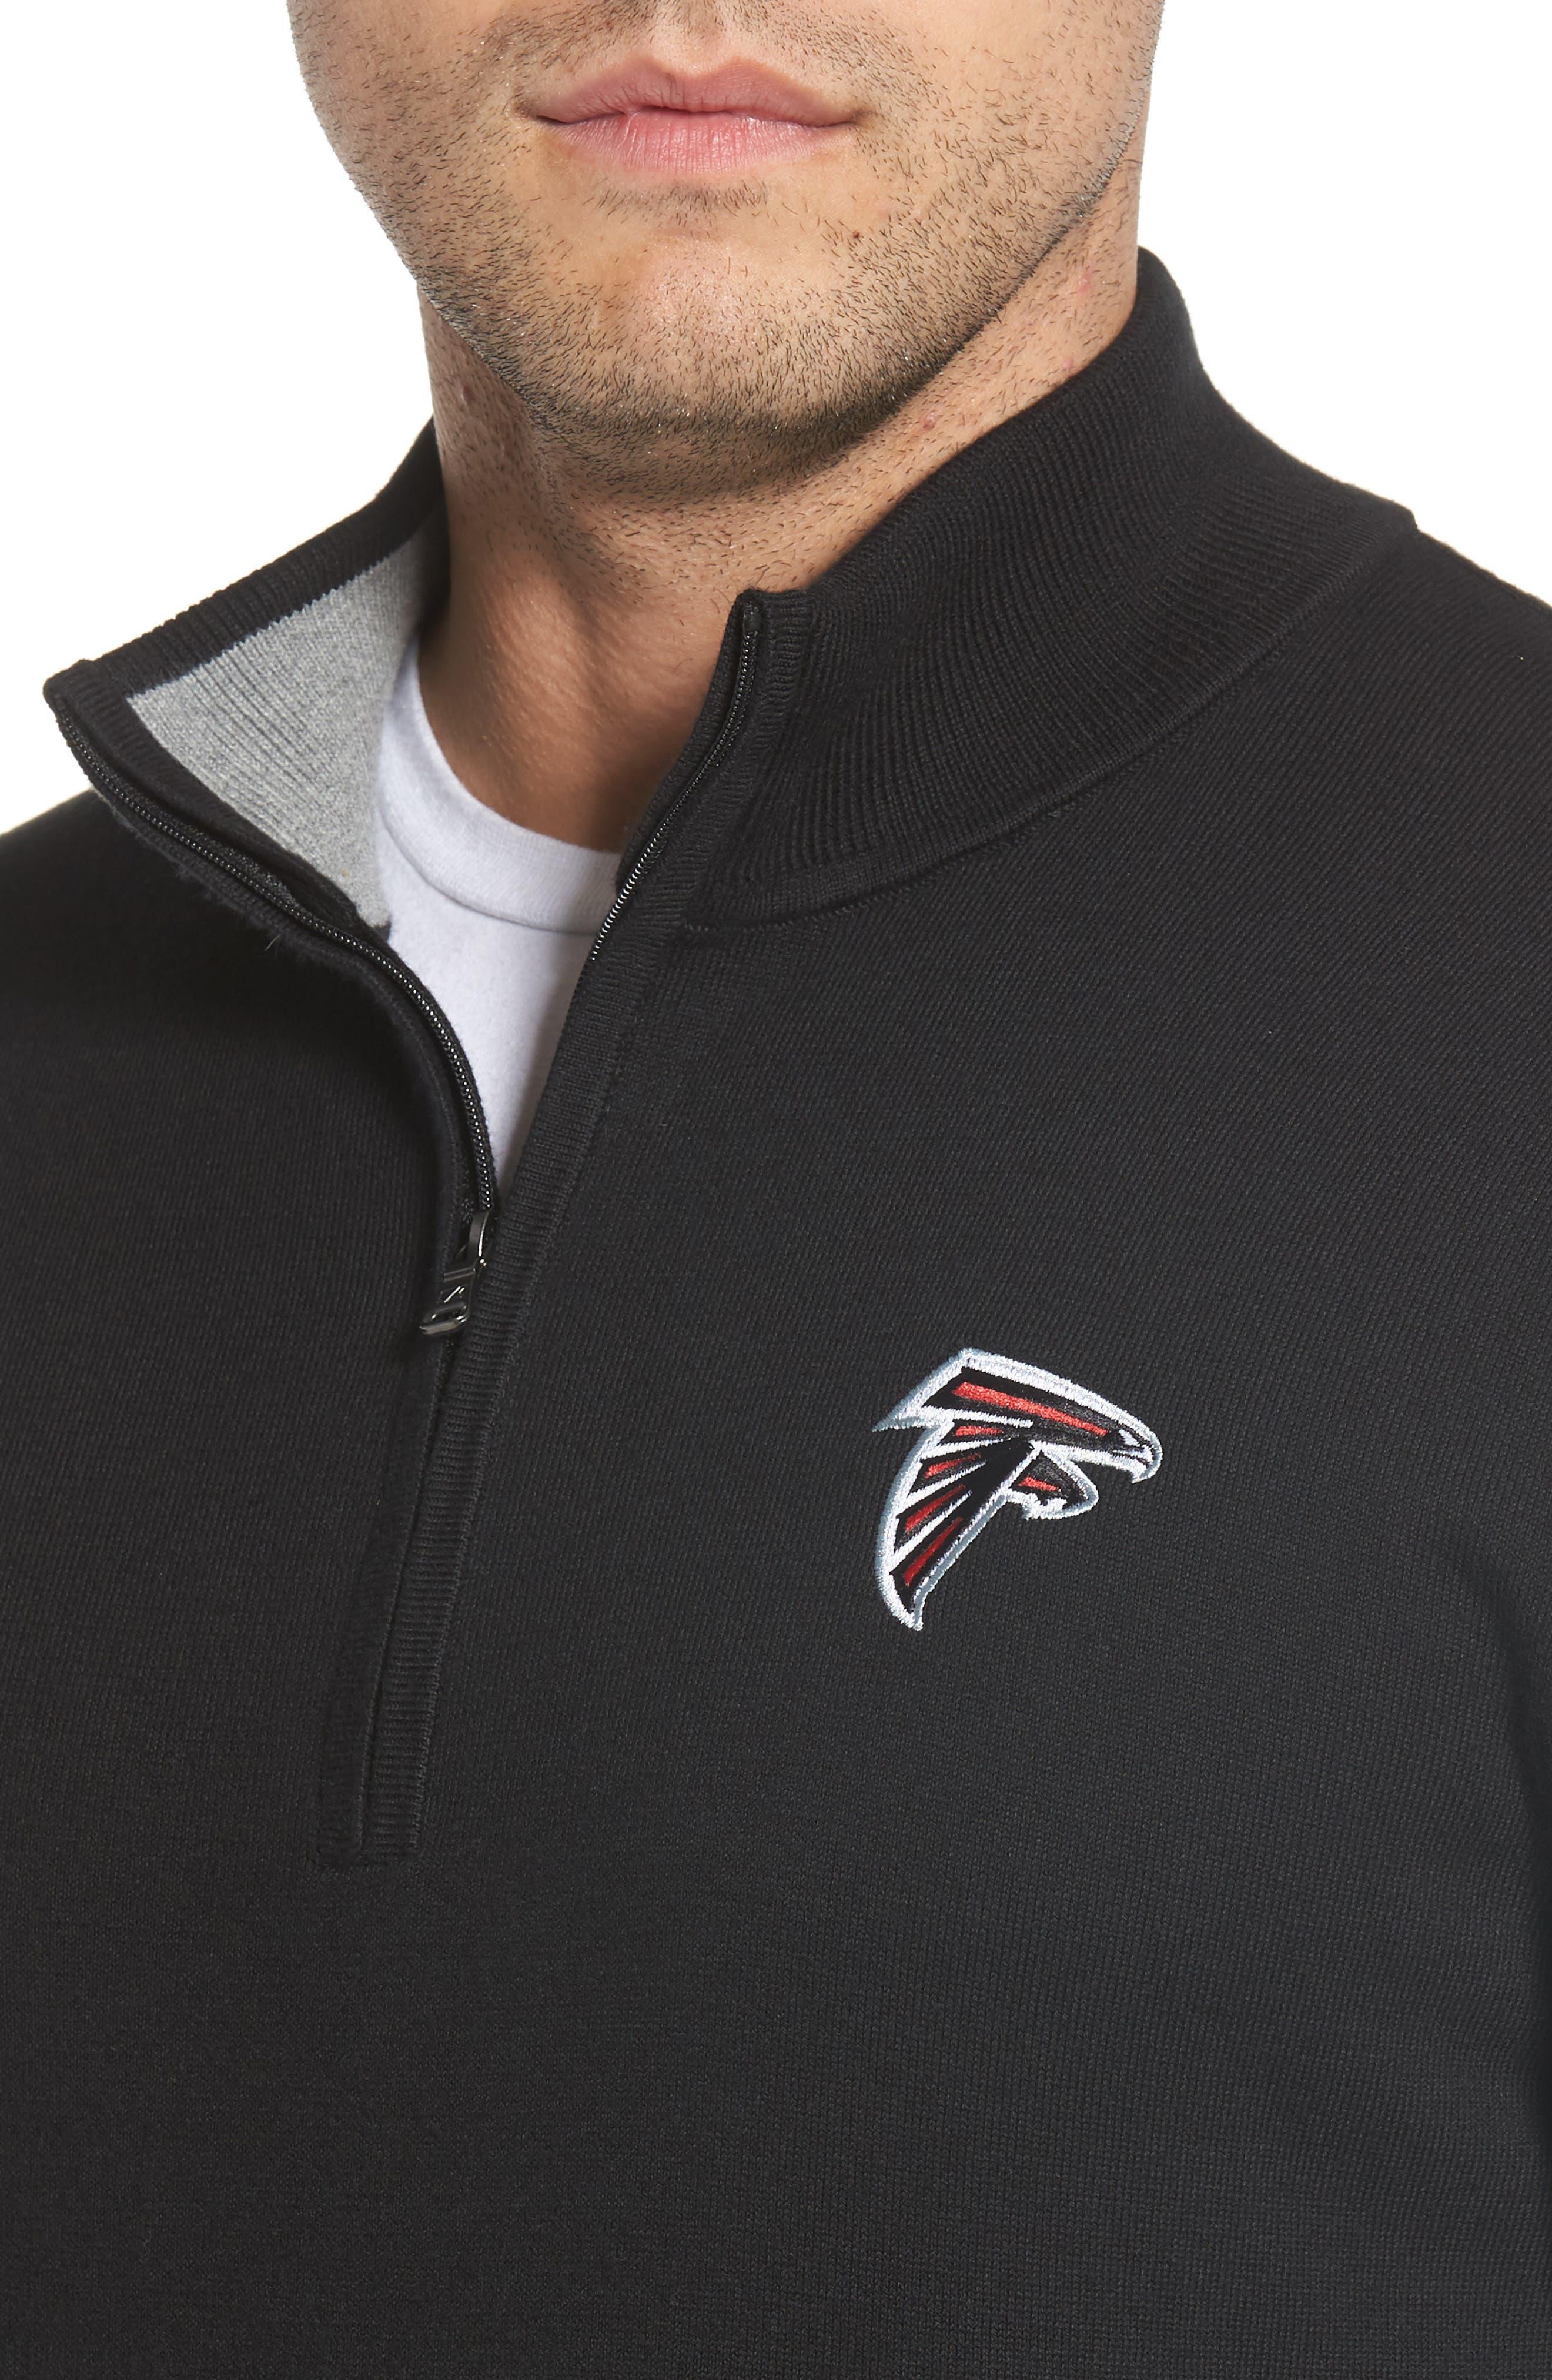 Atlanta Falcons - Lakemont Regular Fit Quarter Zip Sweater,                             Alternate thumbnail 4, color,                             BLACK